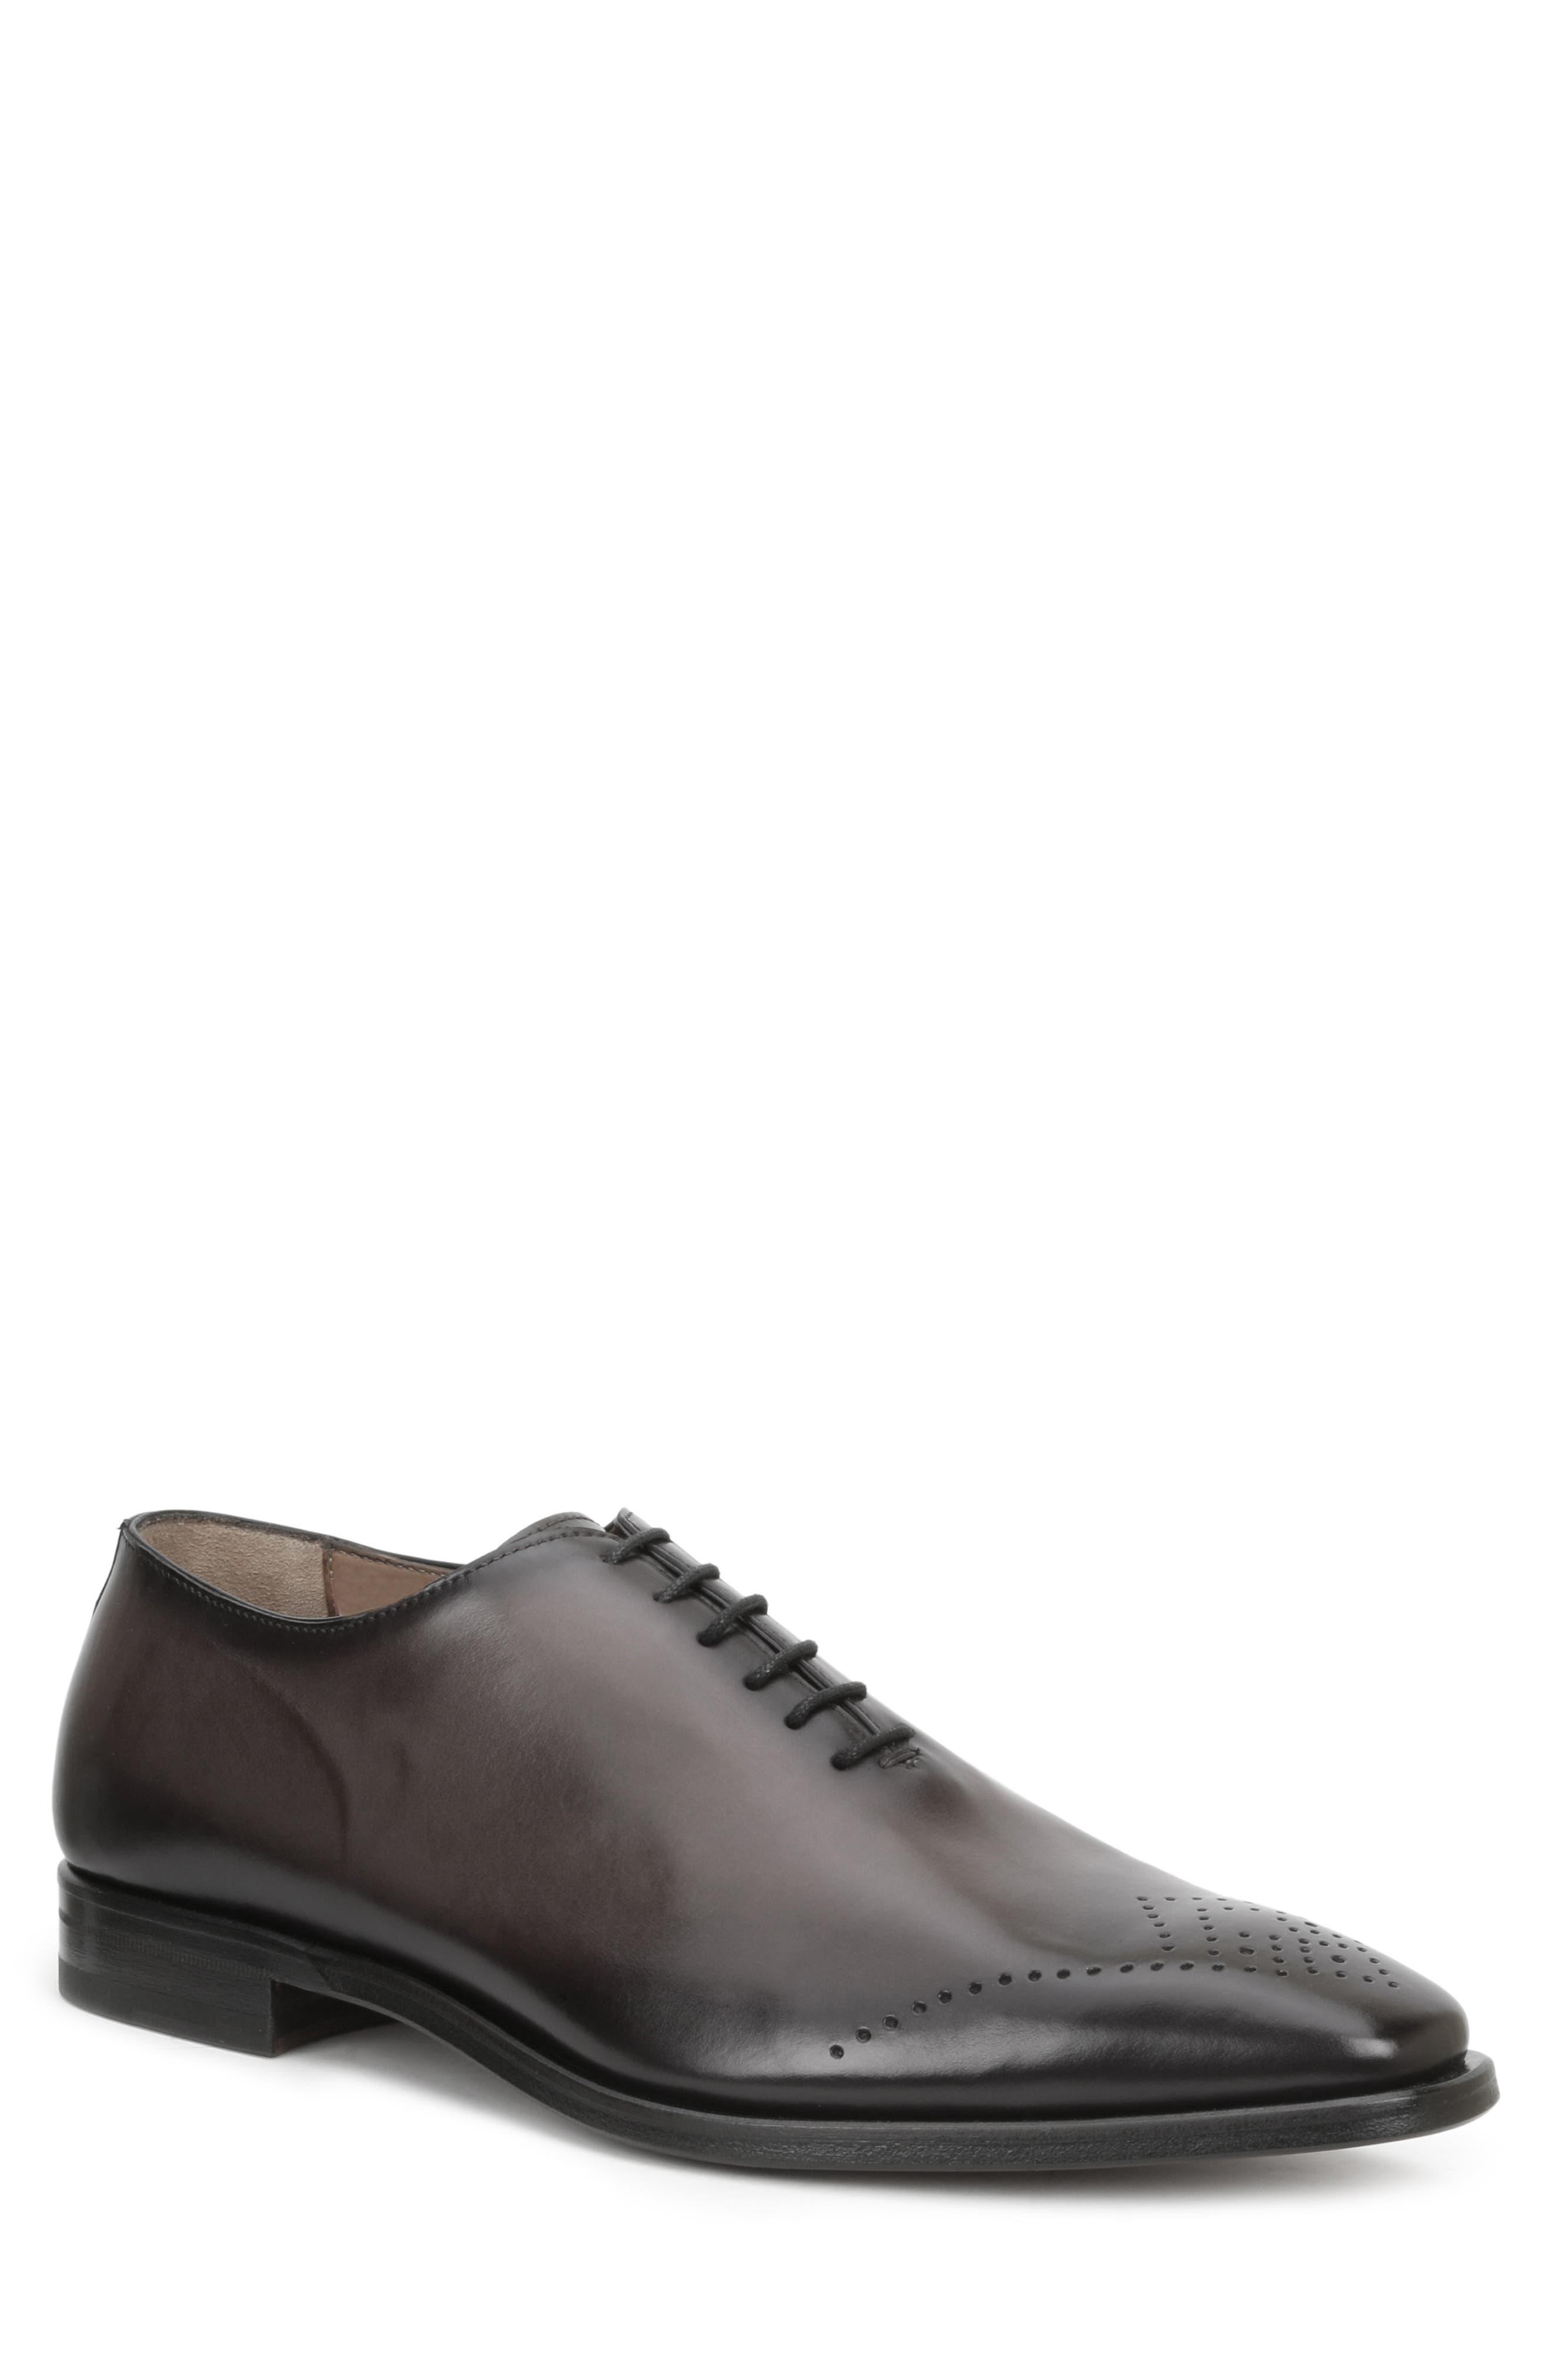 BRUNO MAGLI Claudio Medallion Toe Leather Oxfords in Dark Grey